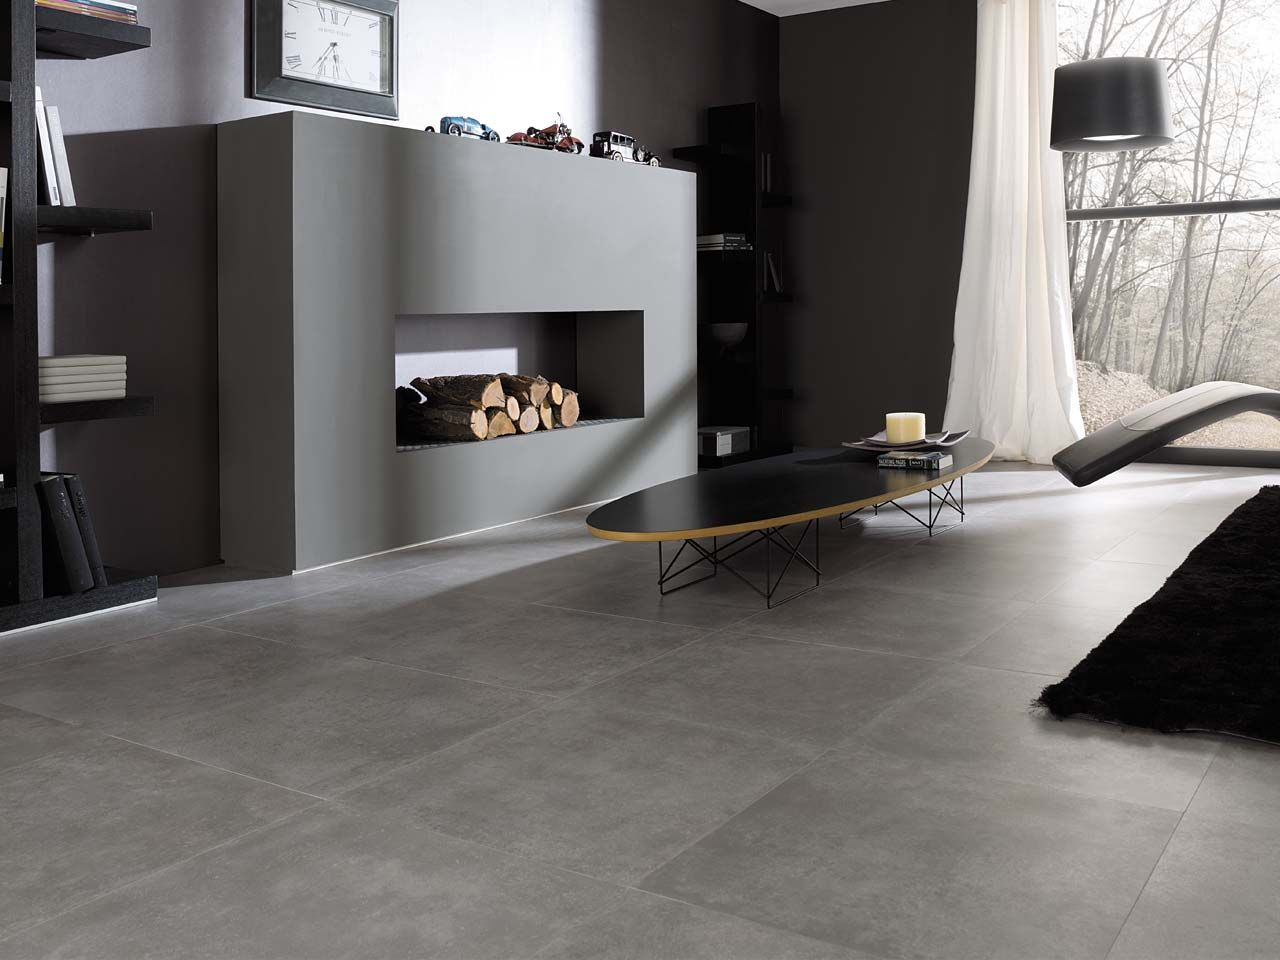 piso l nea ston ker modelo rhin gris de porcelanosa para pisos y m s de quer taro. Black Bedroom Furniture Sets. Home Design Ideas